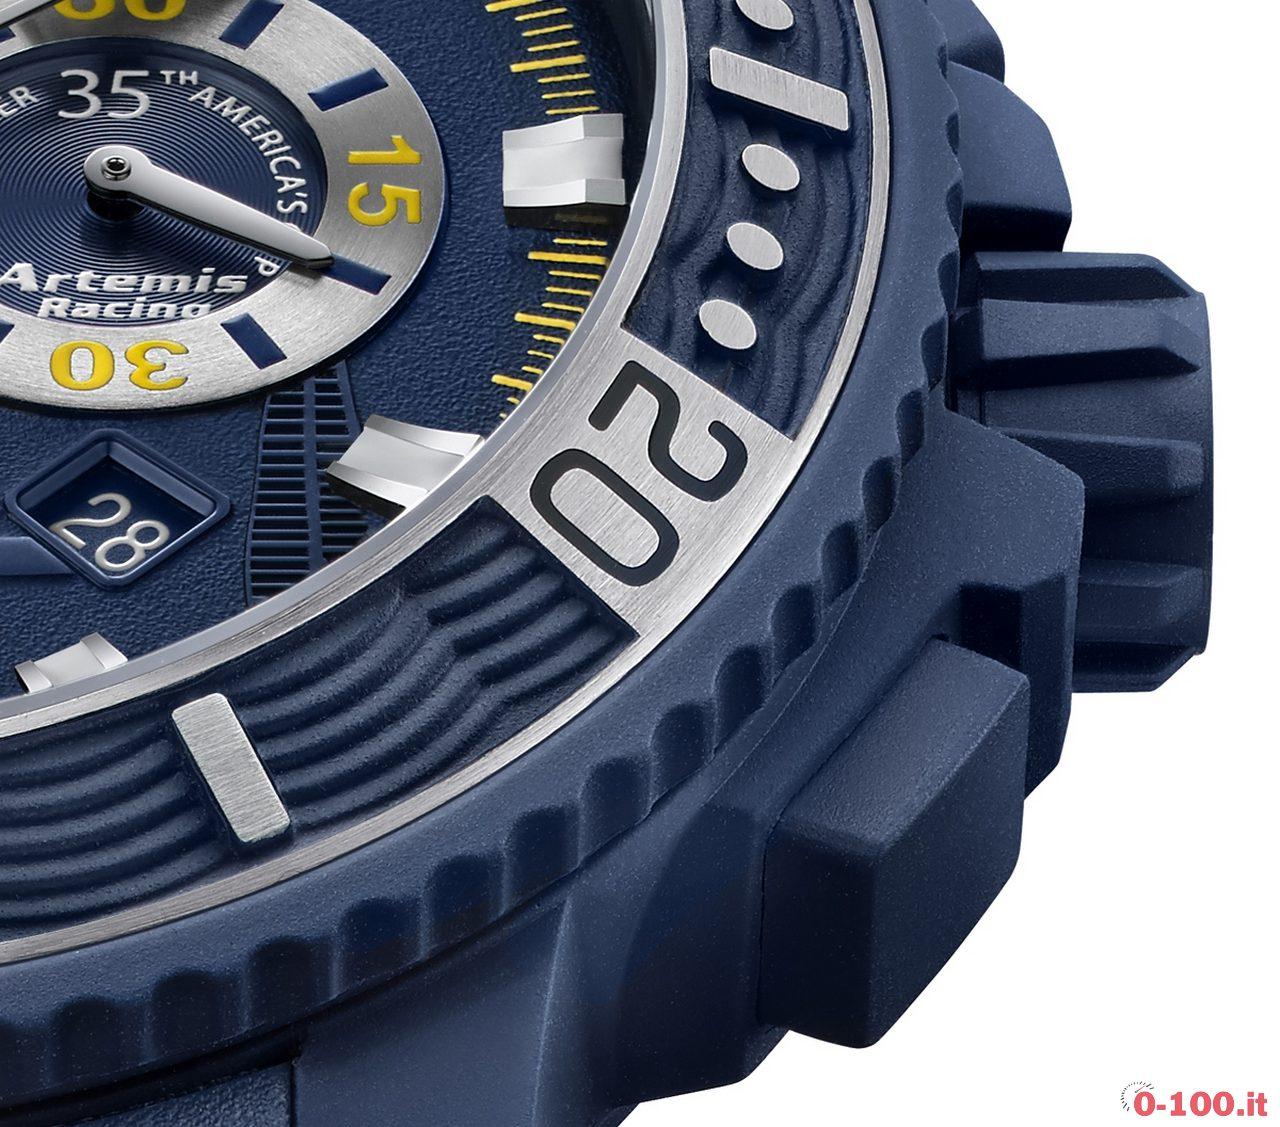 anteprima-sihh-2017-ulysse-nardin-diver-chronograph-artemis-racing-limited-edition-ref-353-98le-3artemis-prezzo-price_0-1003